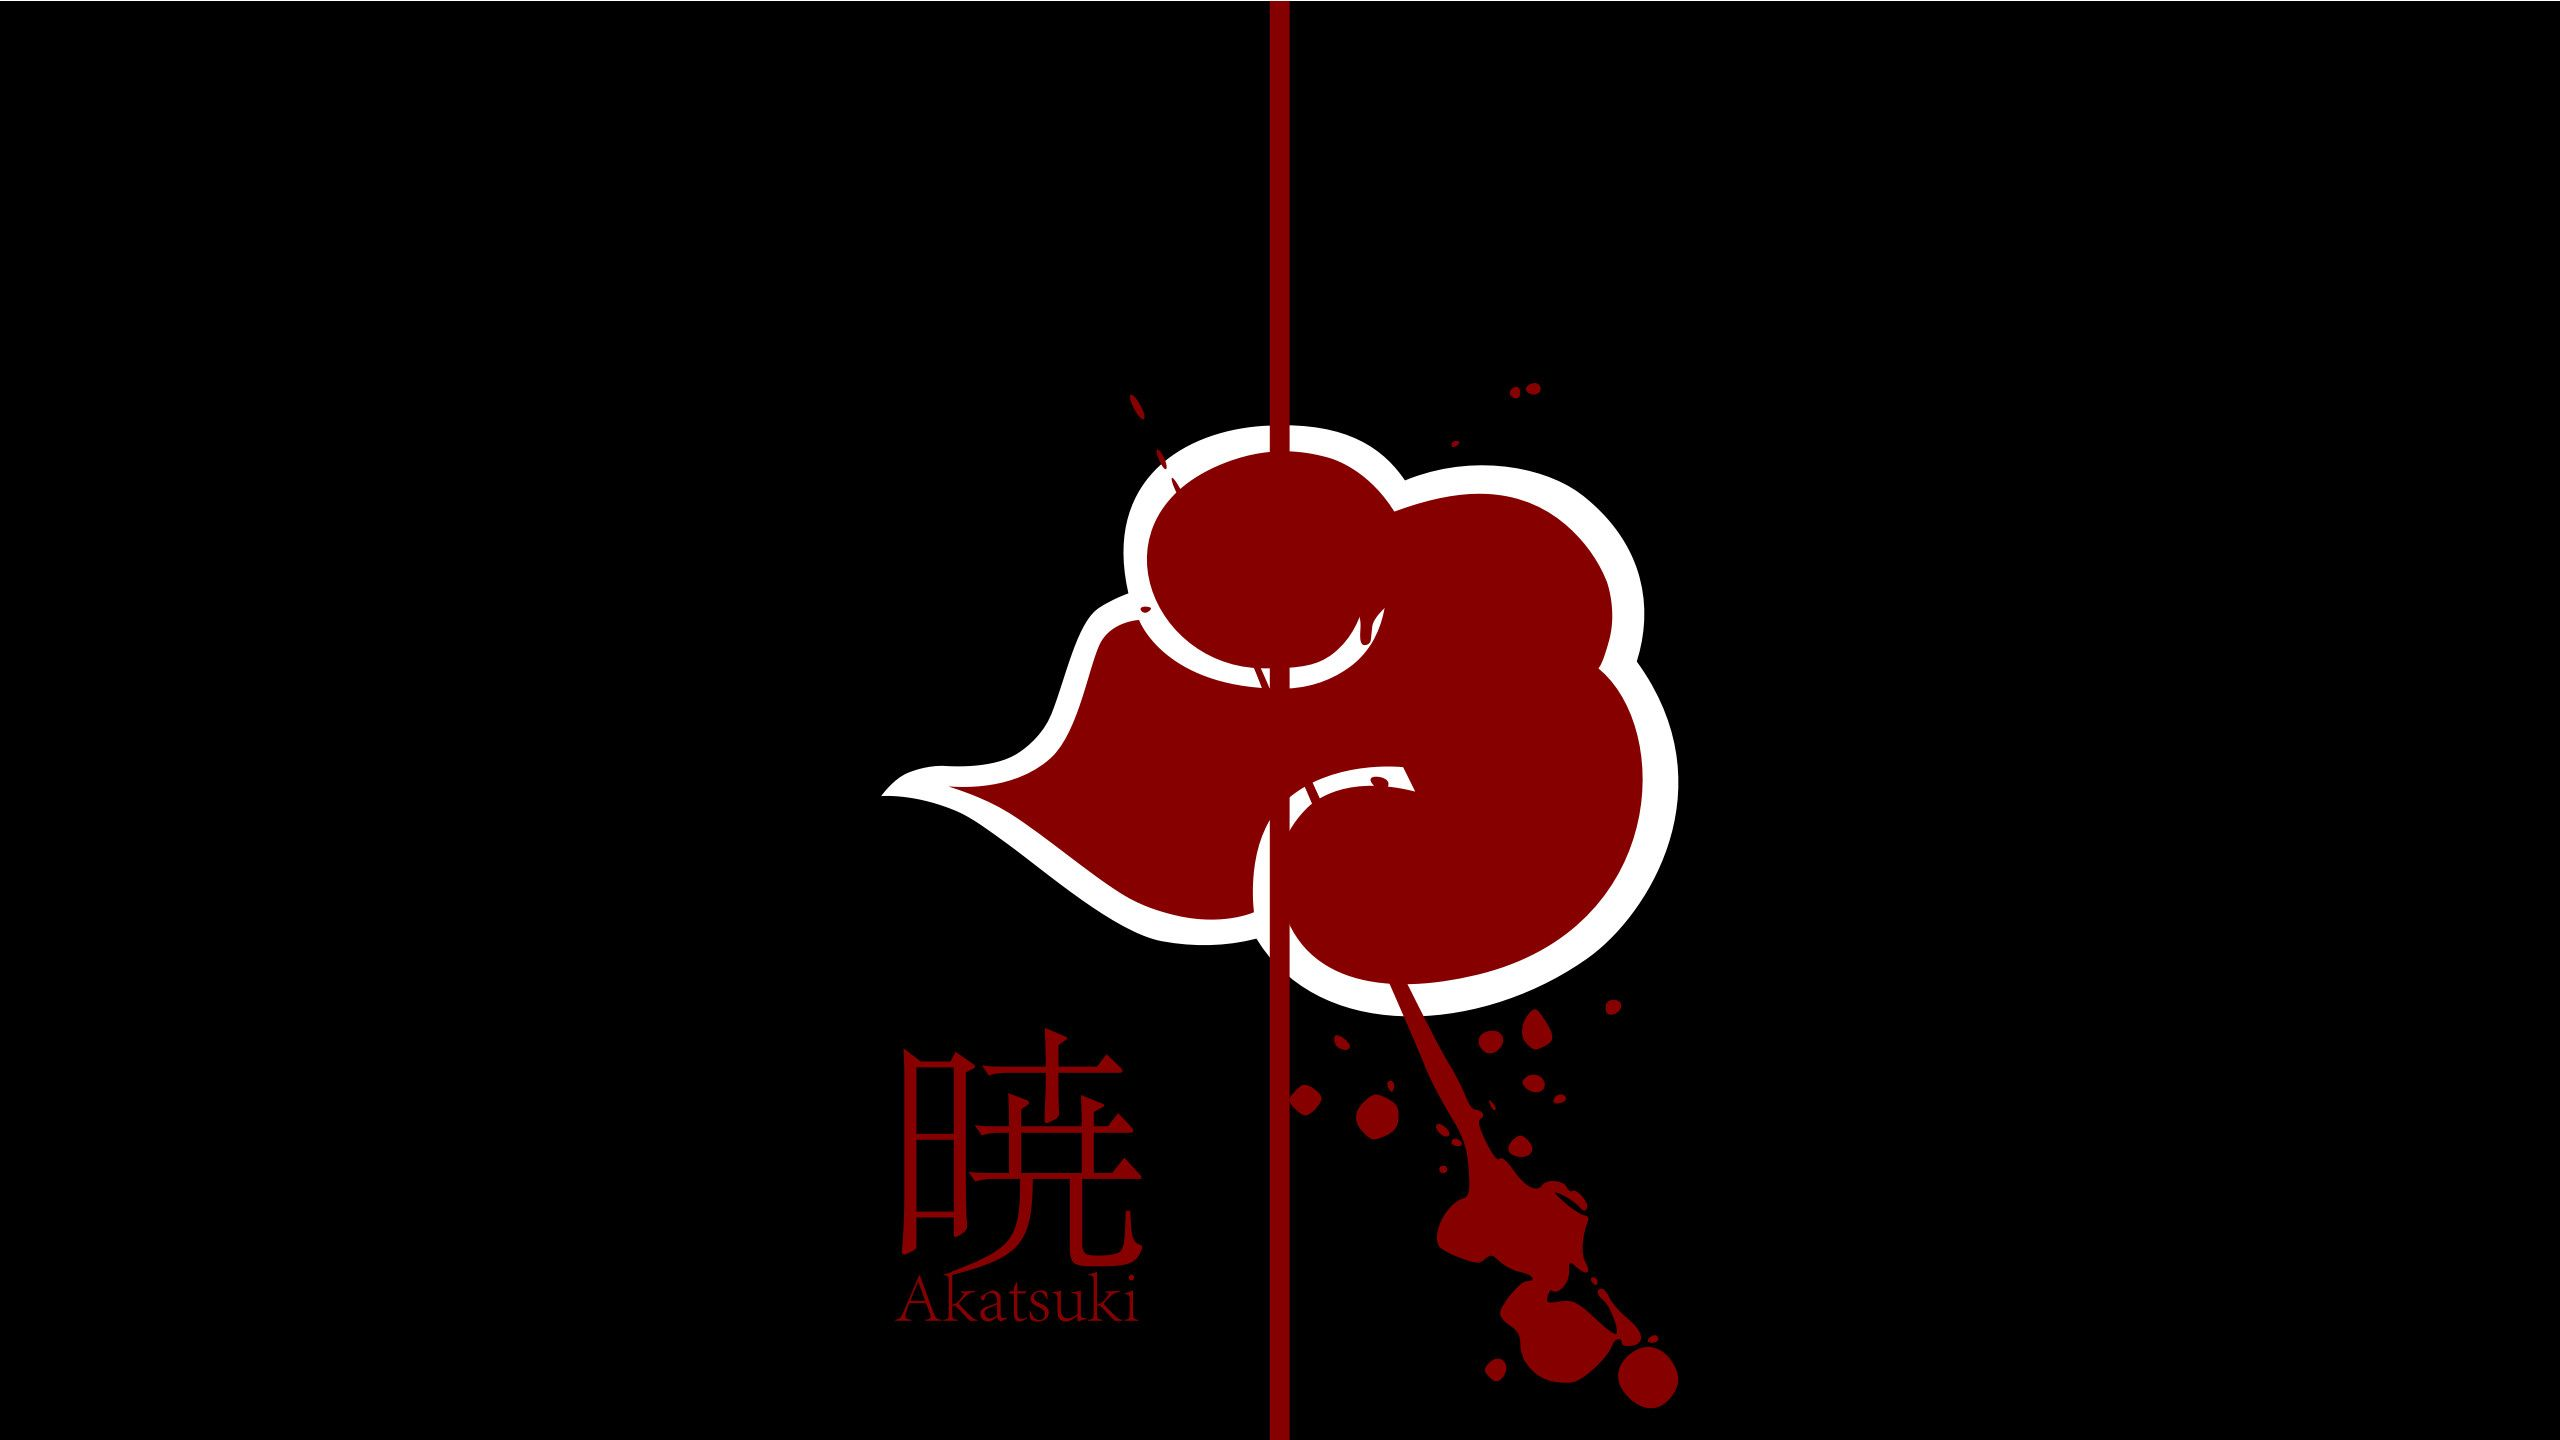 Akatsuki Wallpapers Top Free Akatsuki Backgrounds Wallpaperaccess